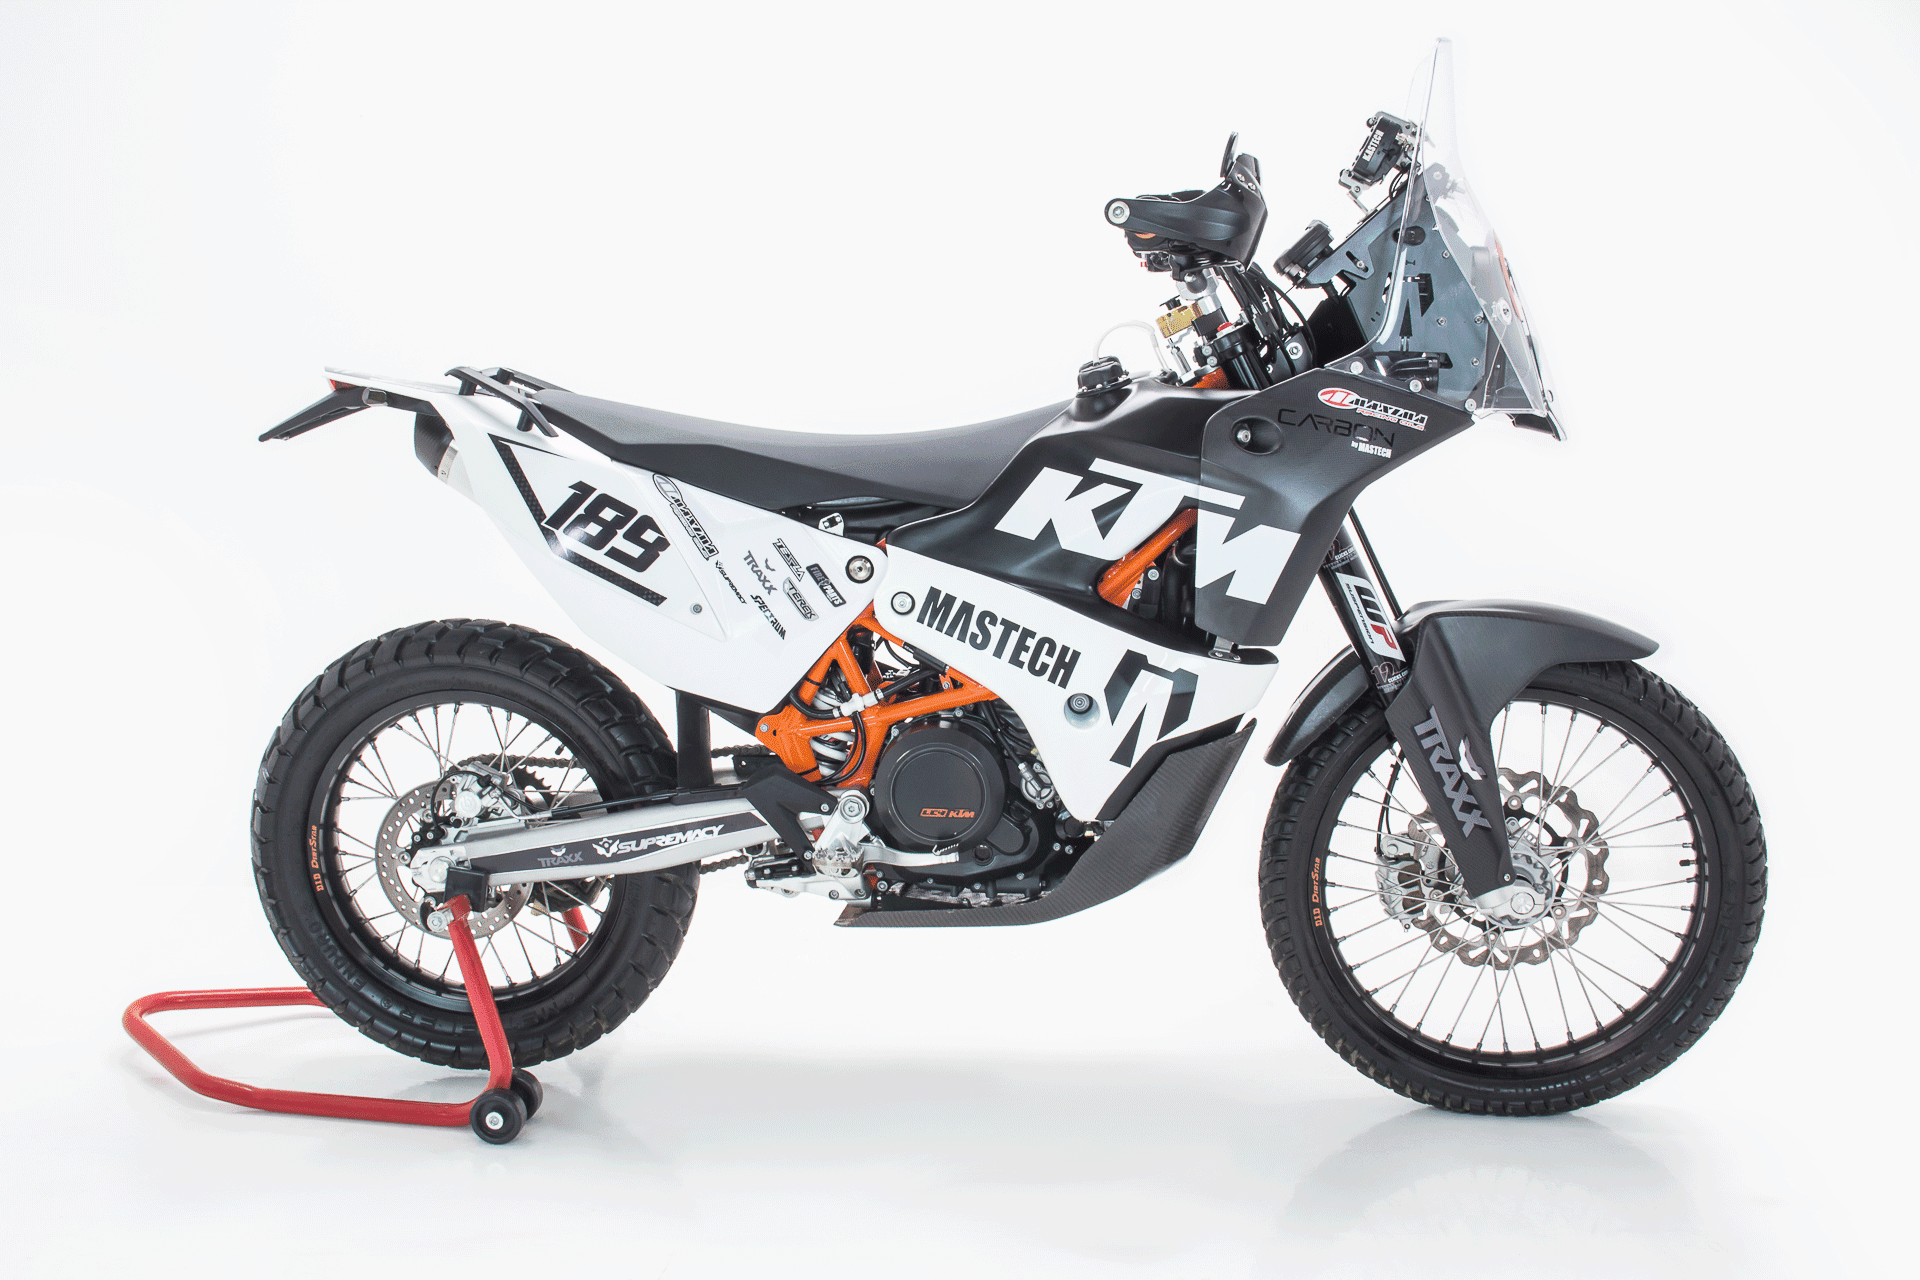 KTM 690 ENDURO ADV-RALLY KIT 2008-2018